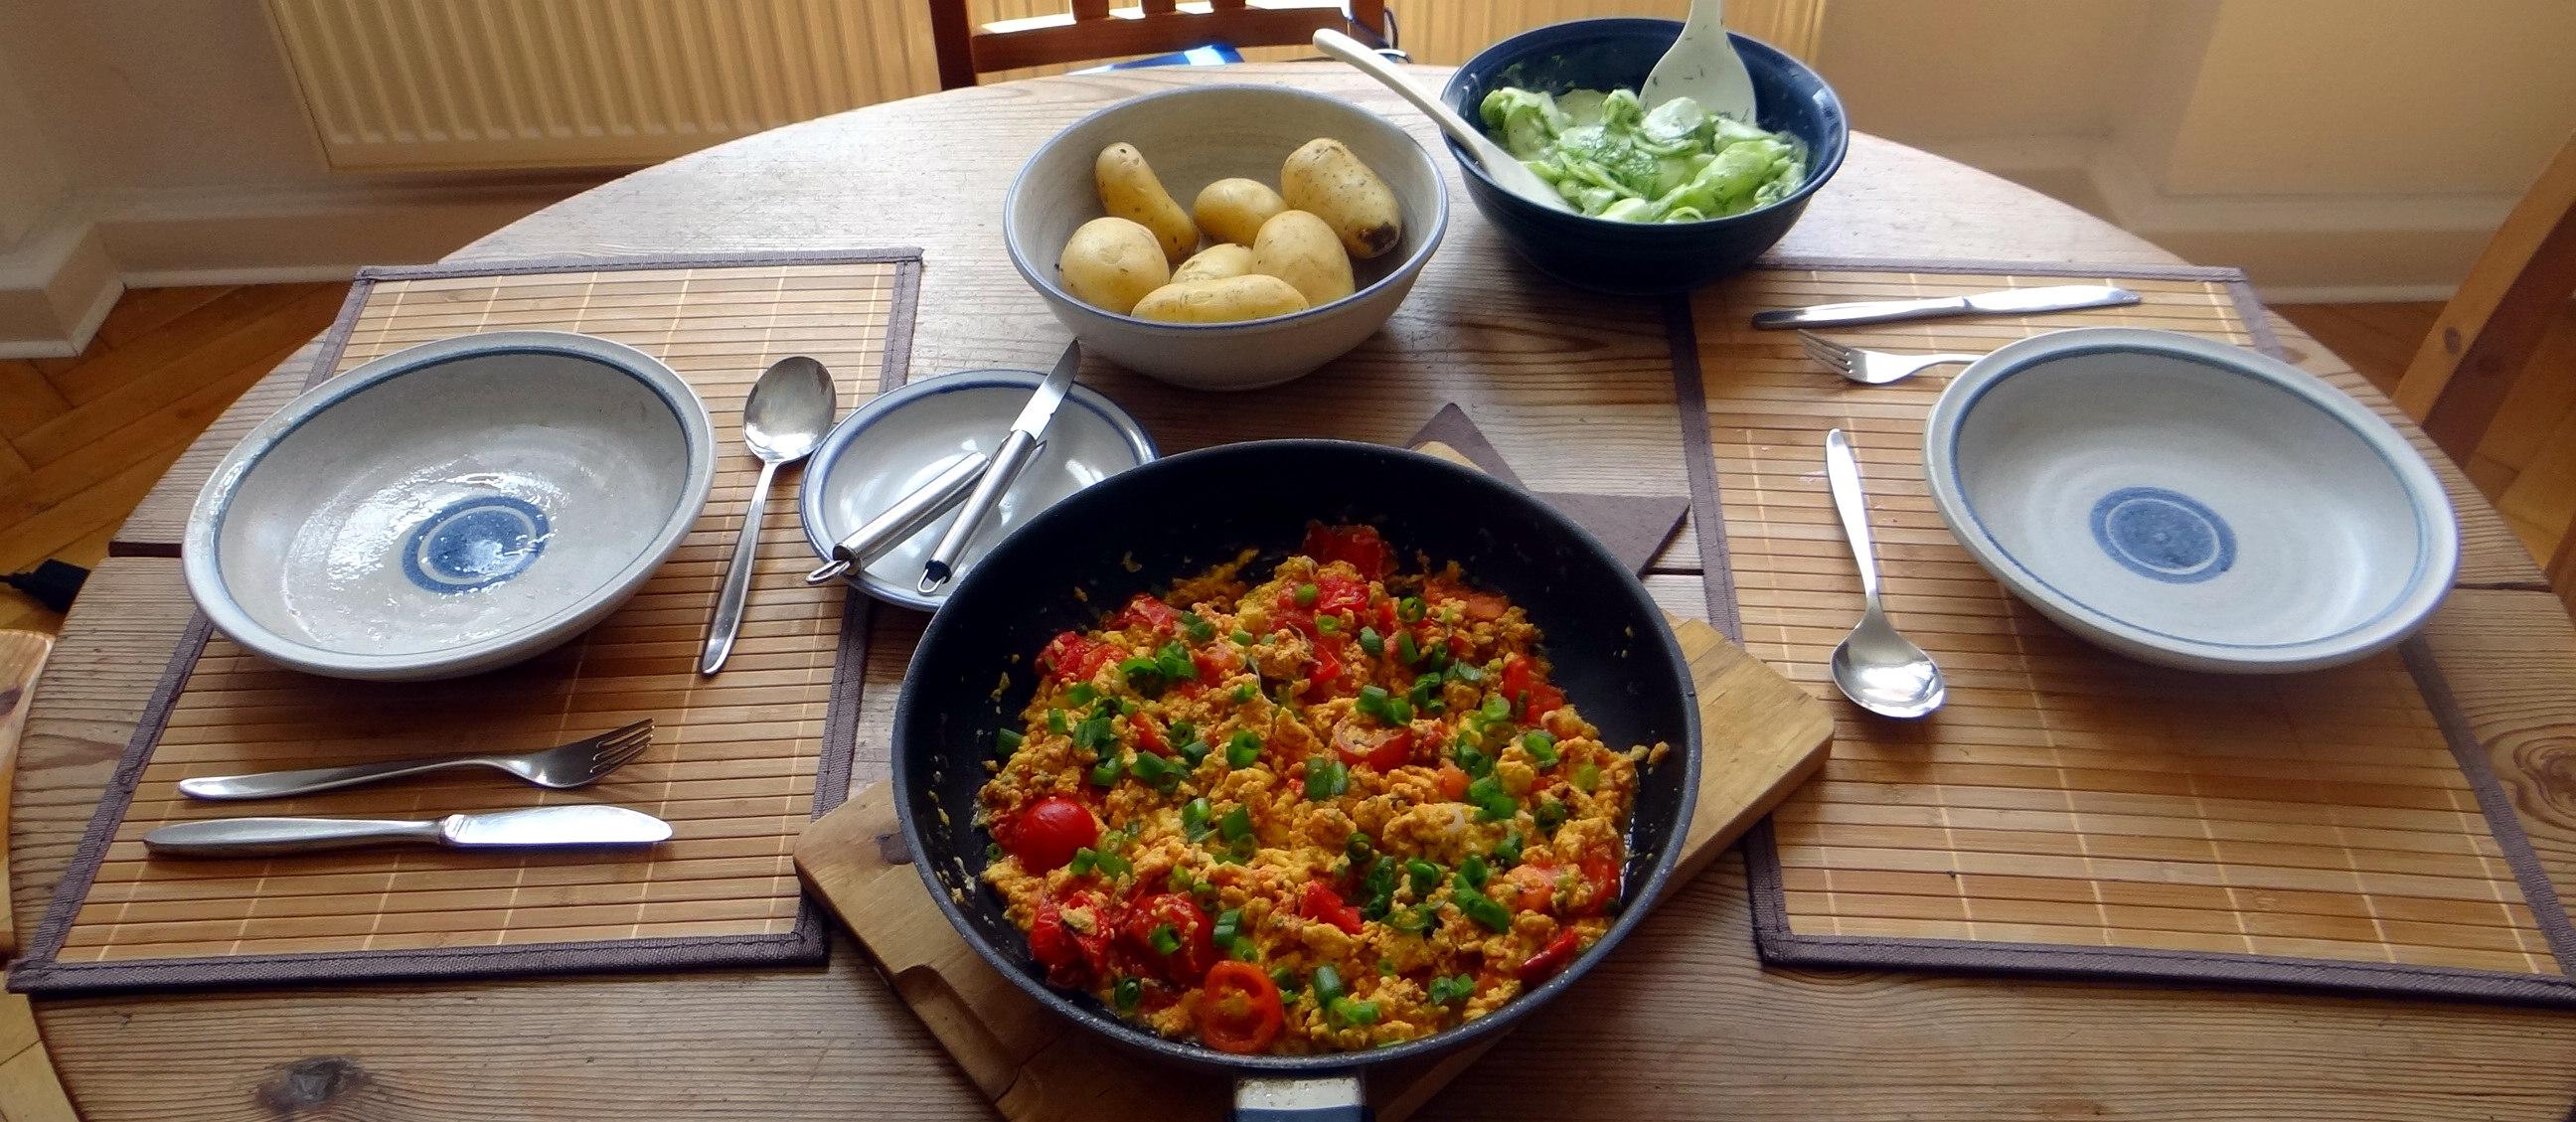 Rührei mit Tomaten,Pellkartoffeln,Gurkensalat,Erdbeeren,vegetarisch (4)